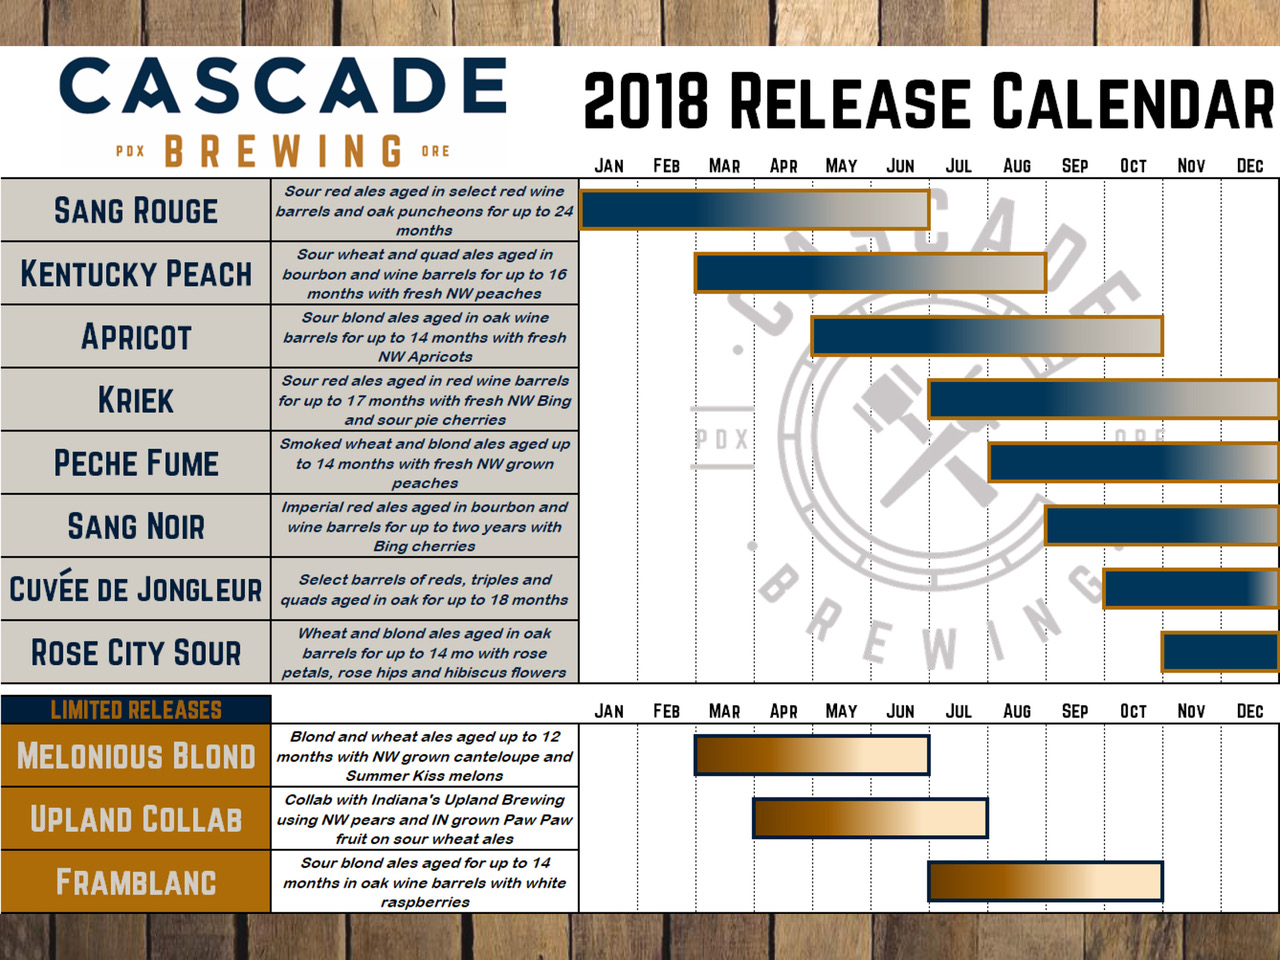 2018 Cascade Brewing Beer Release Calendar